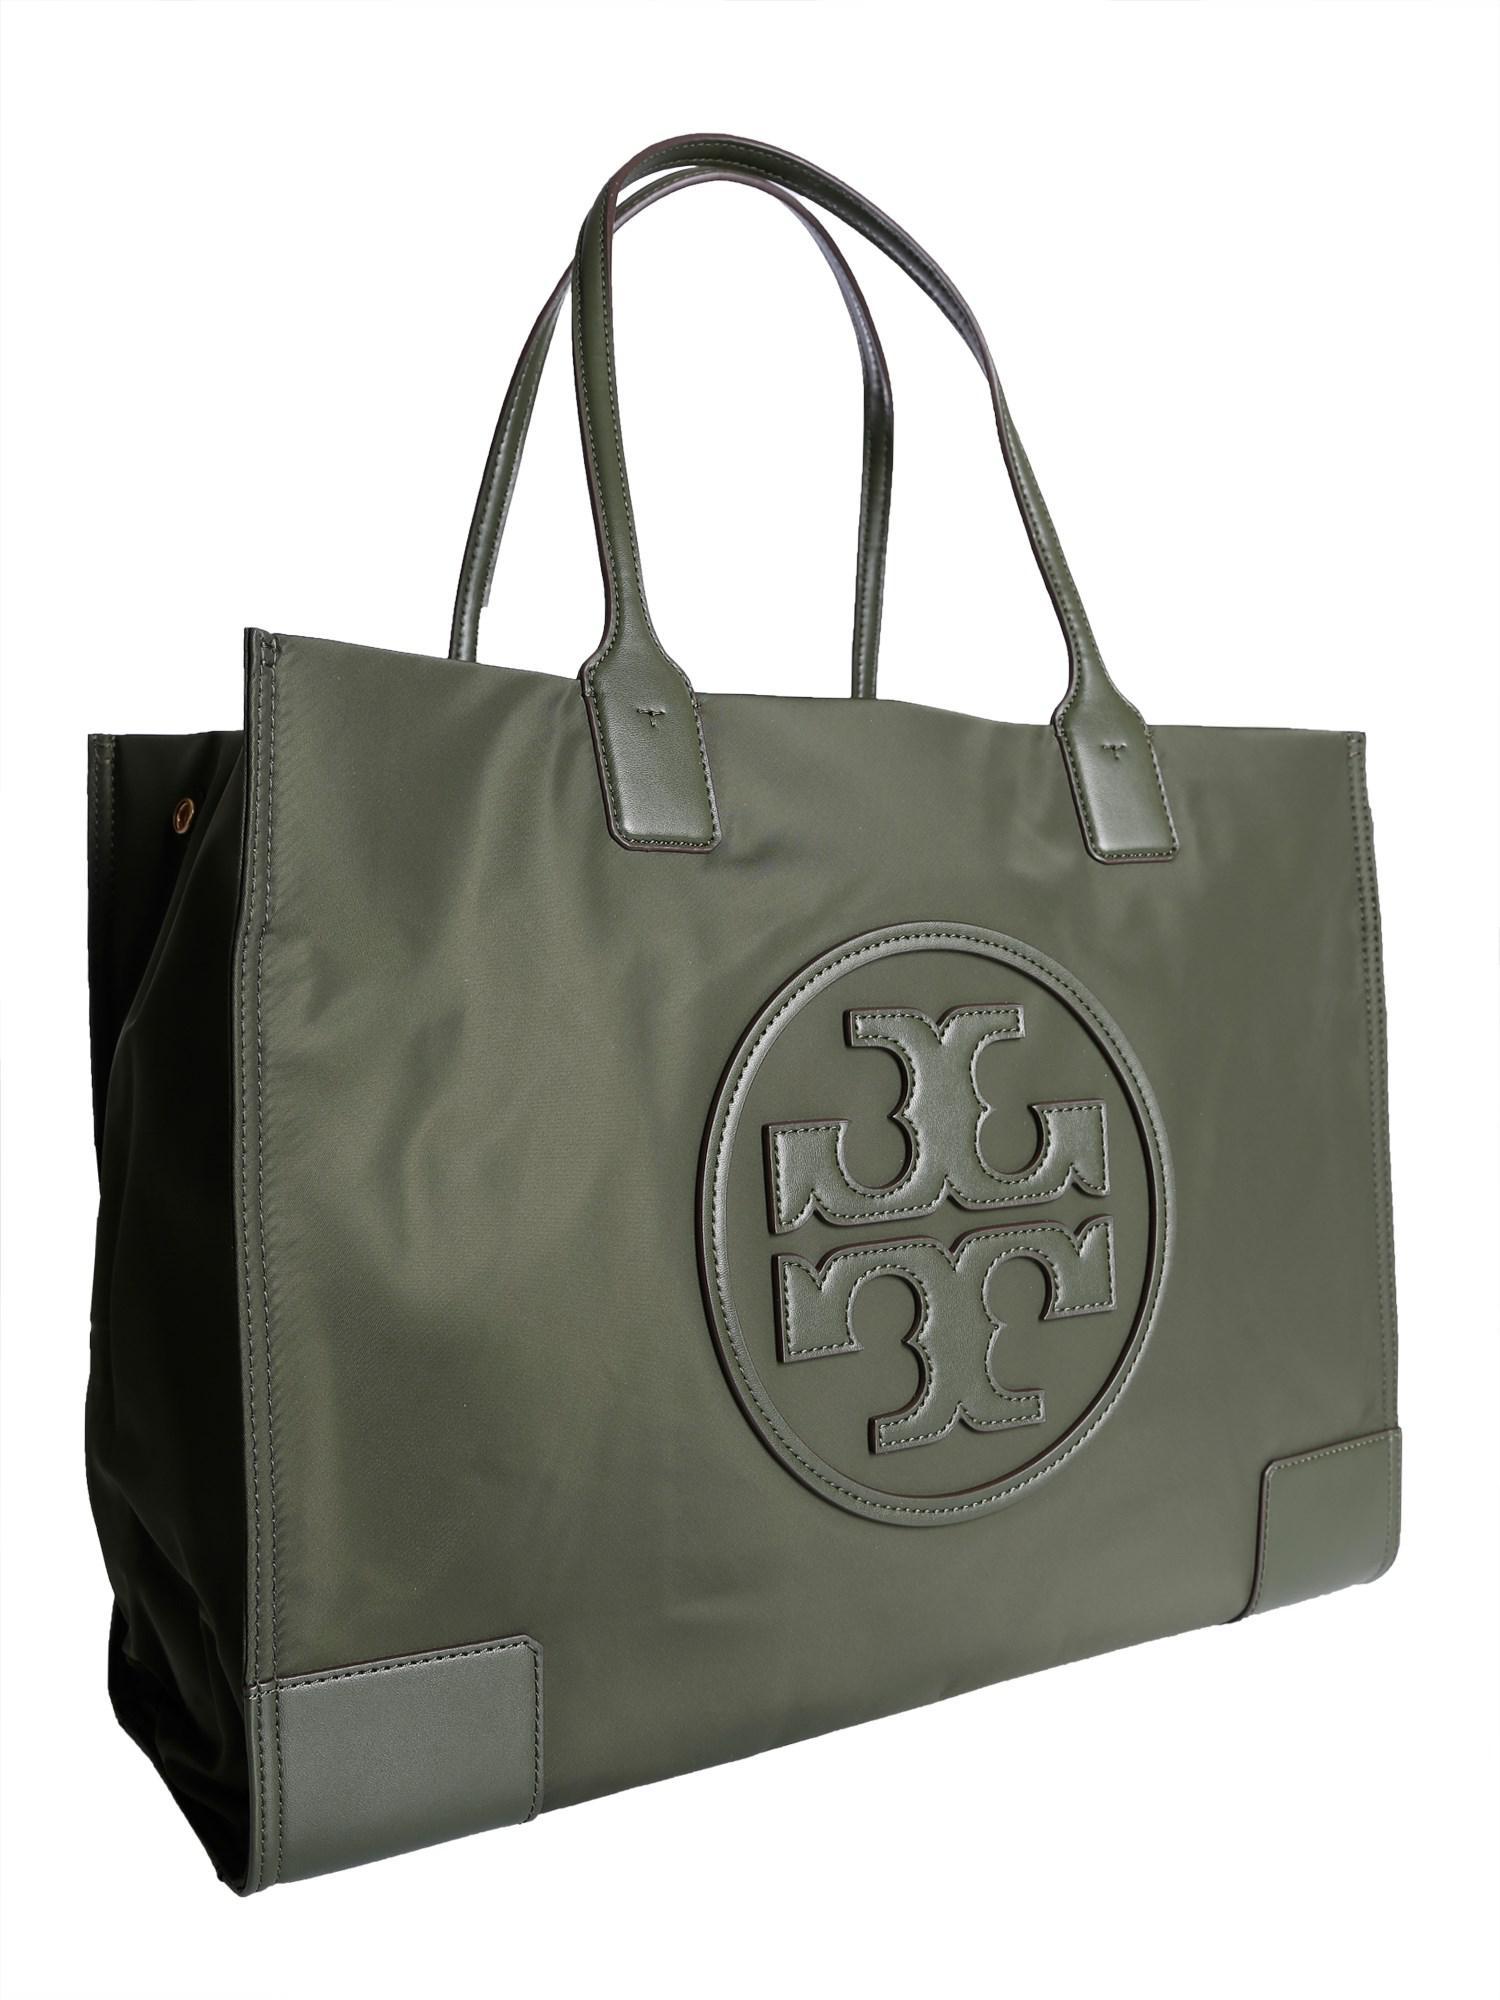 9e8542466435 Tory Burch - Green Ella Tote Bag In Technical Fabric - Lyst. View fullscreen